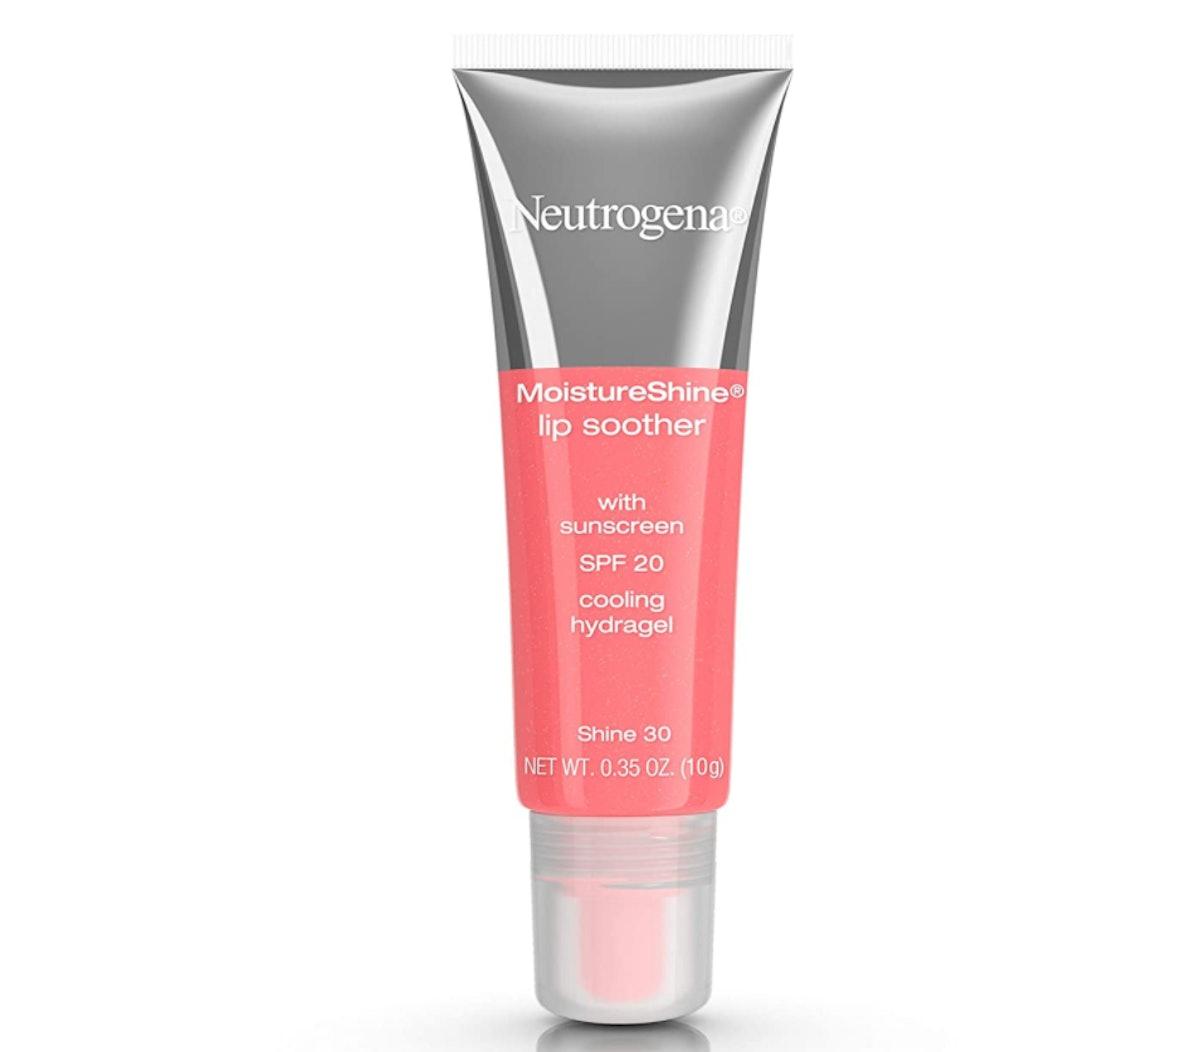 Neutrogena MoistureShine Lip Soother Gloss SPF 20